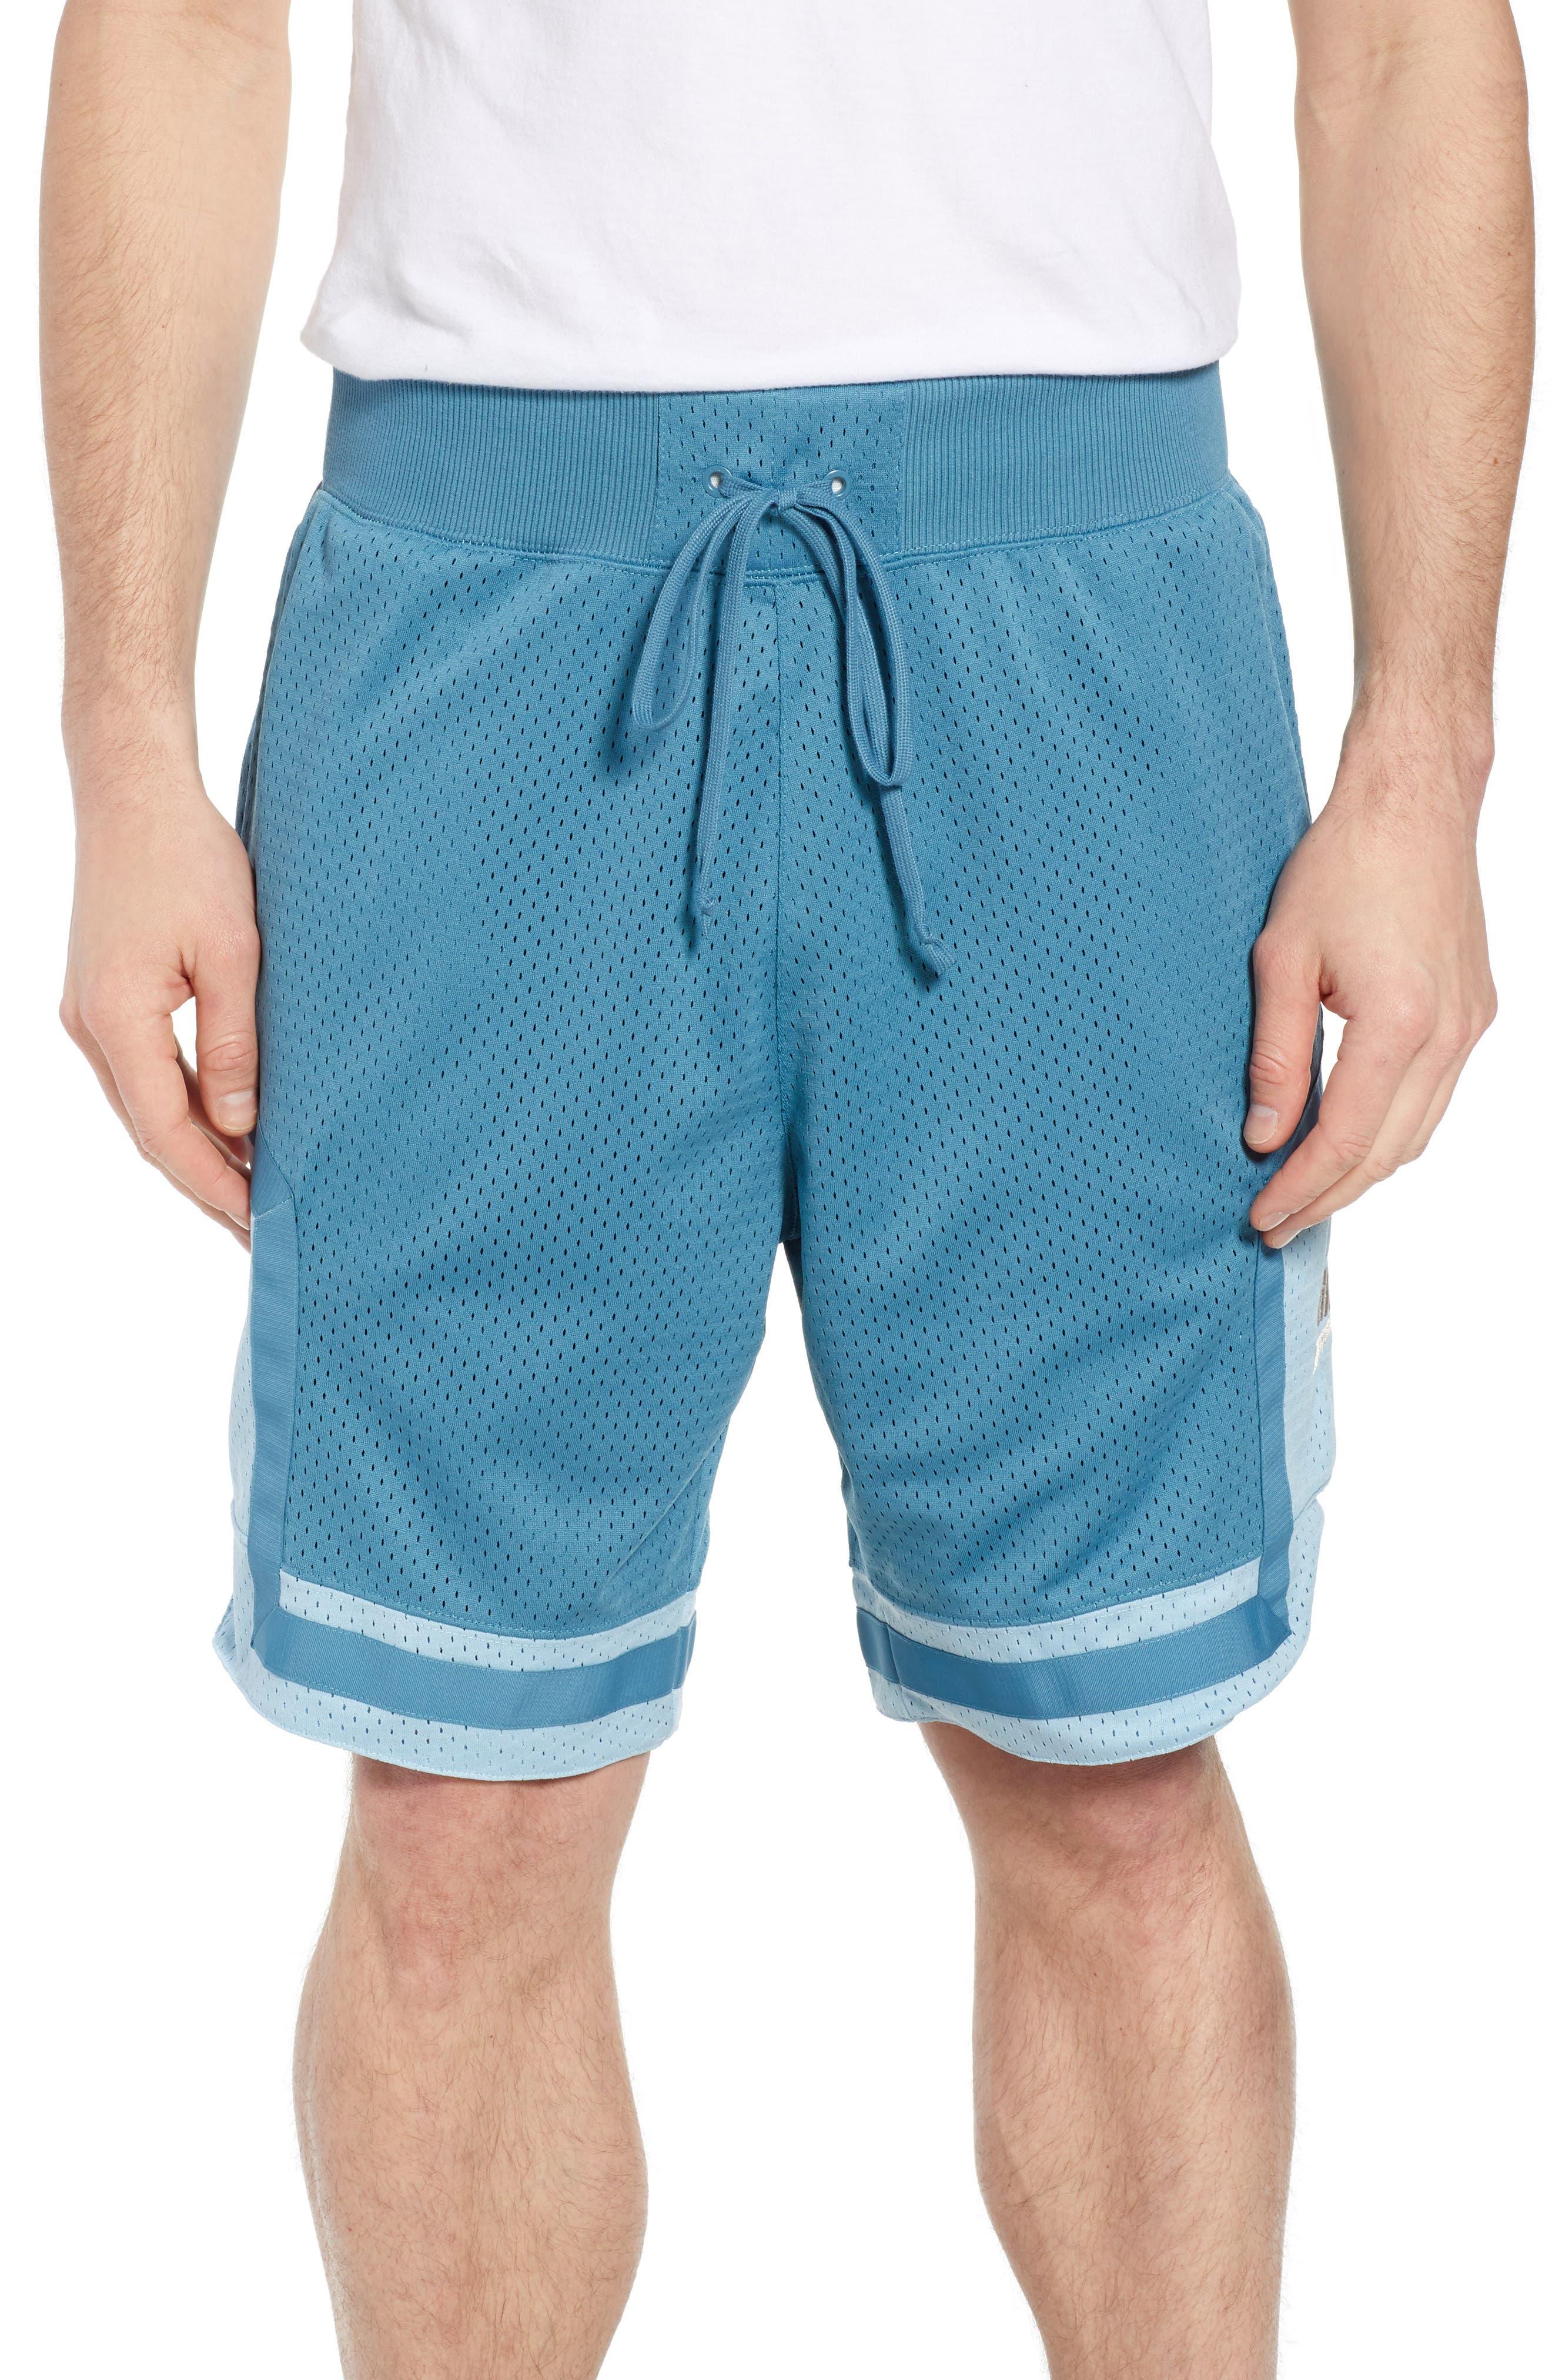 NSW AF1 Shorts,                         Main,                         color, AQUA/ OCEAN BLISS/ OREWOOD